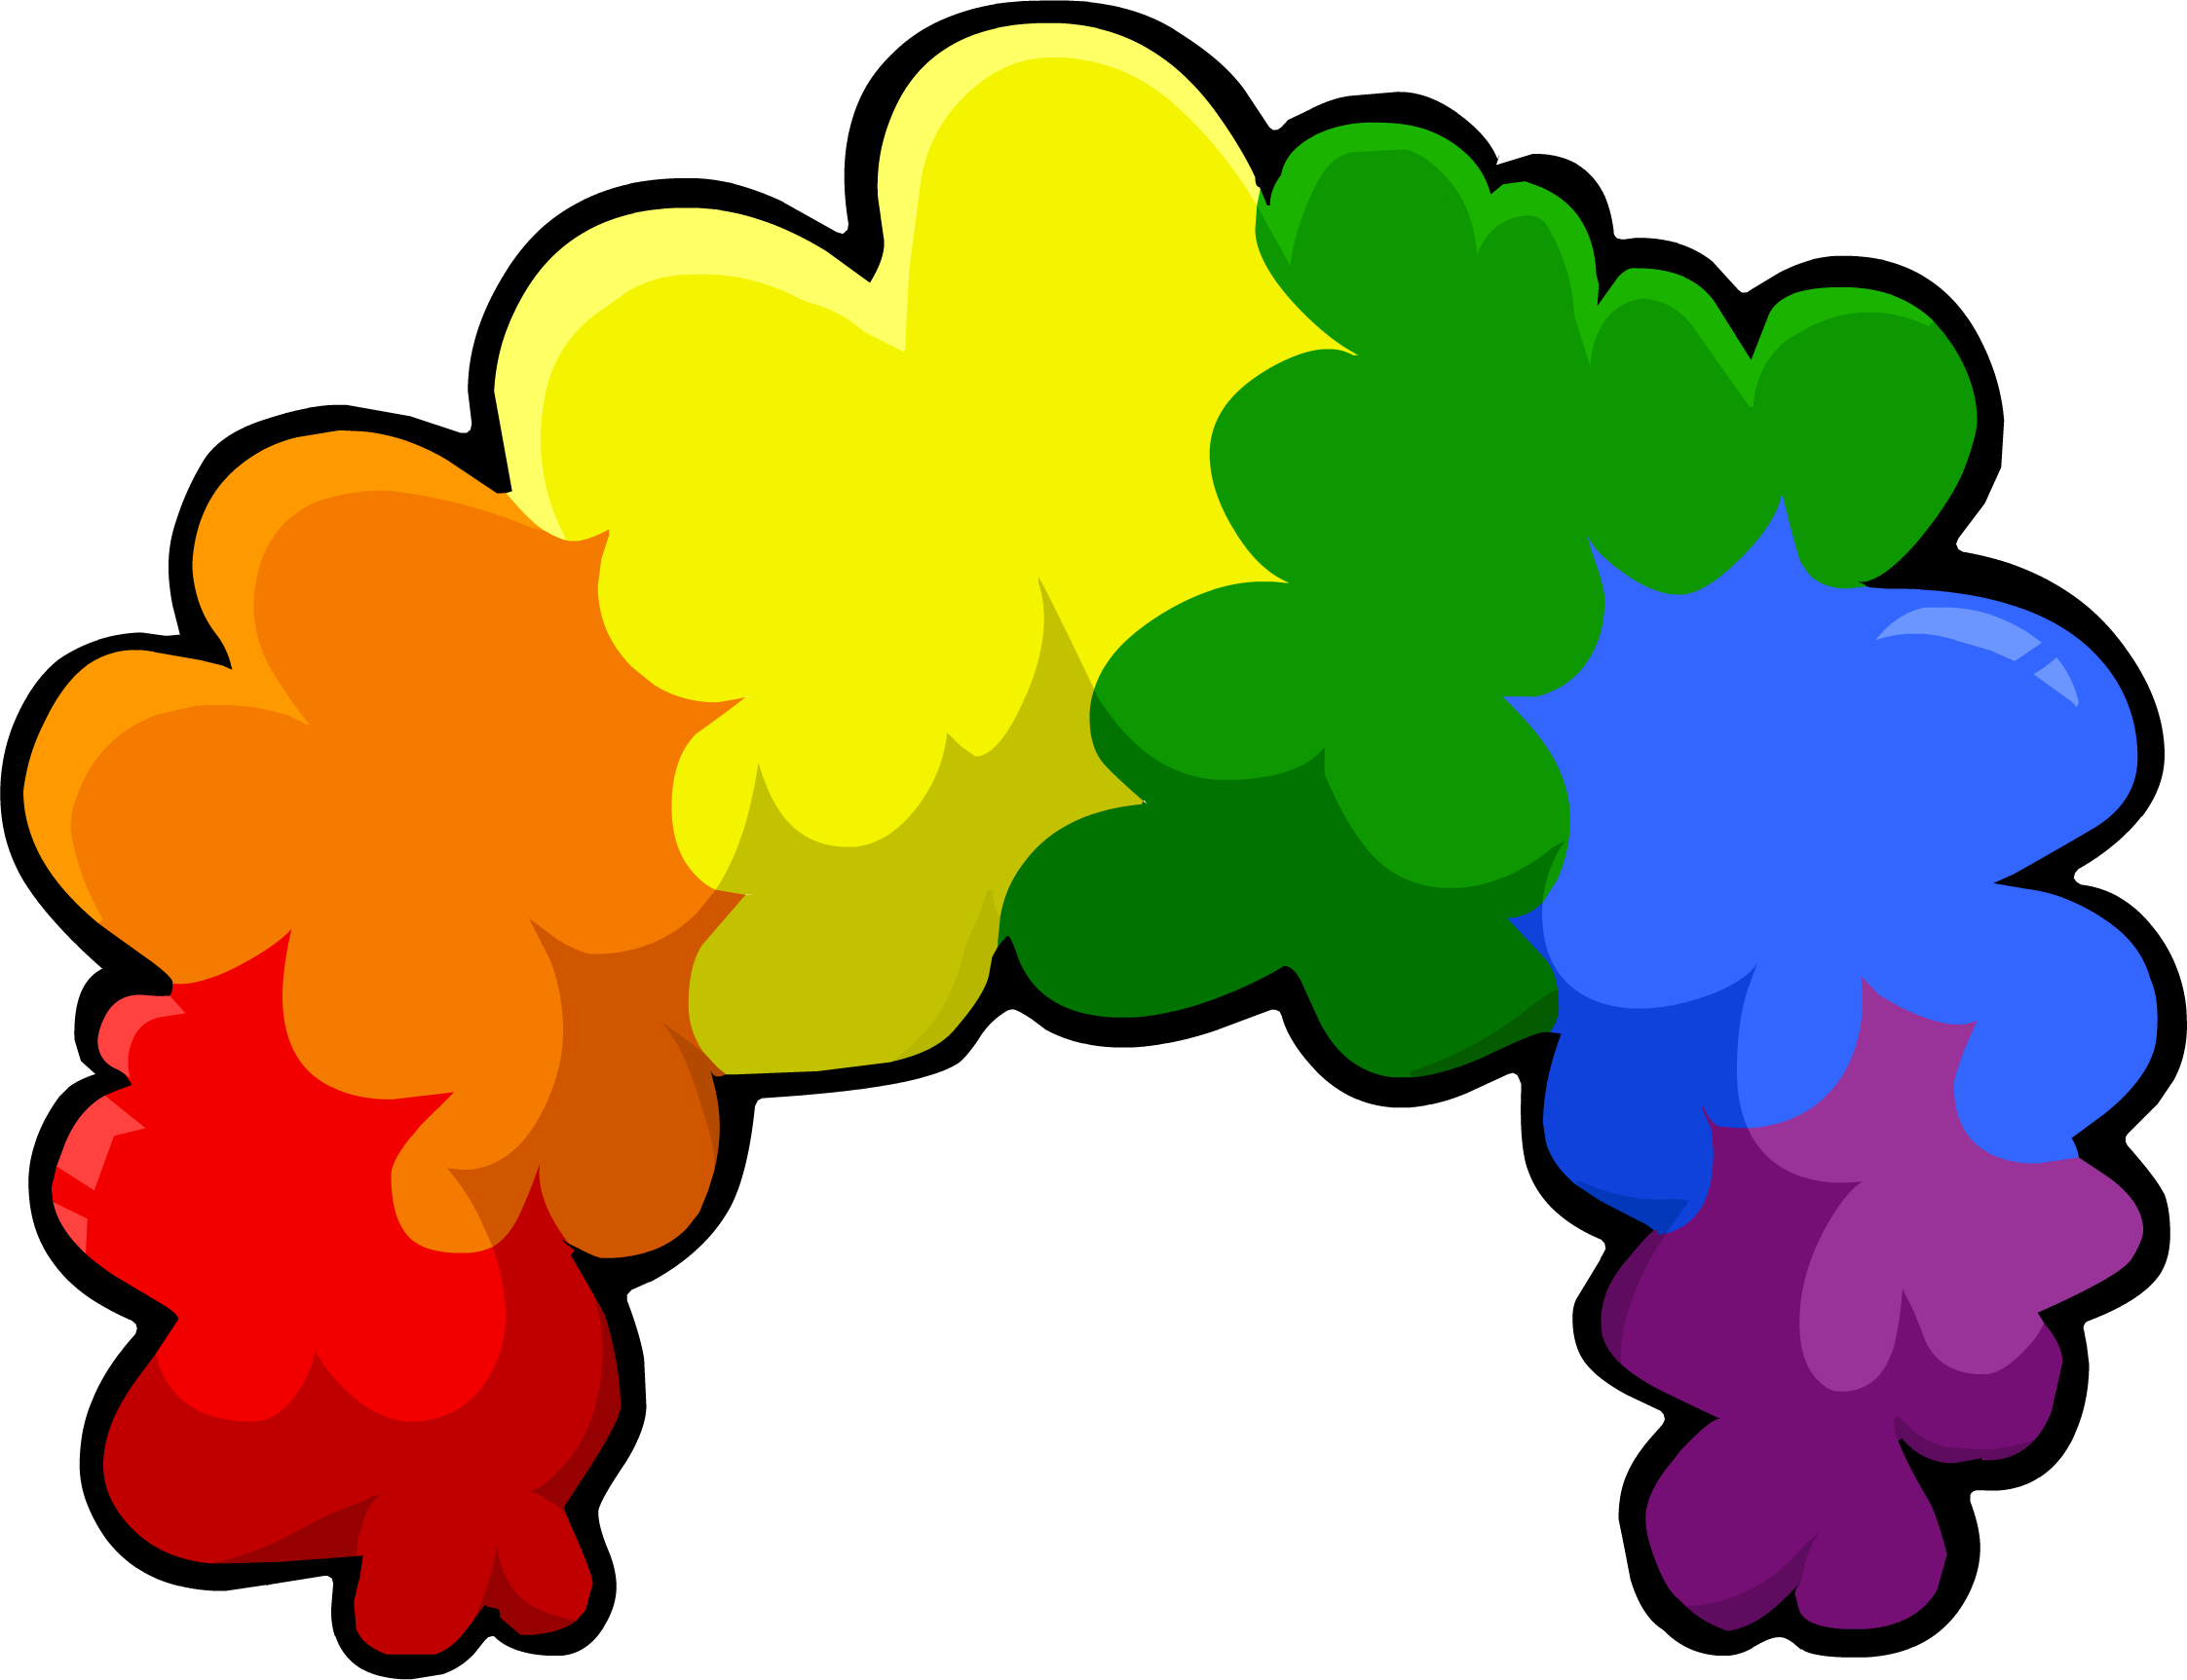 Rainbow pumpkin clipart jpg library Rainbow Fro | Club Penguin Wiki | FANDOM powered by Wikia jpg library